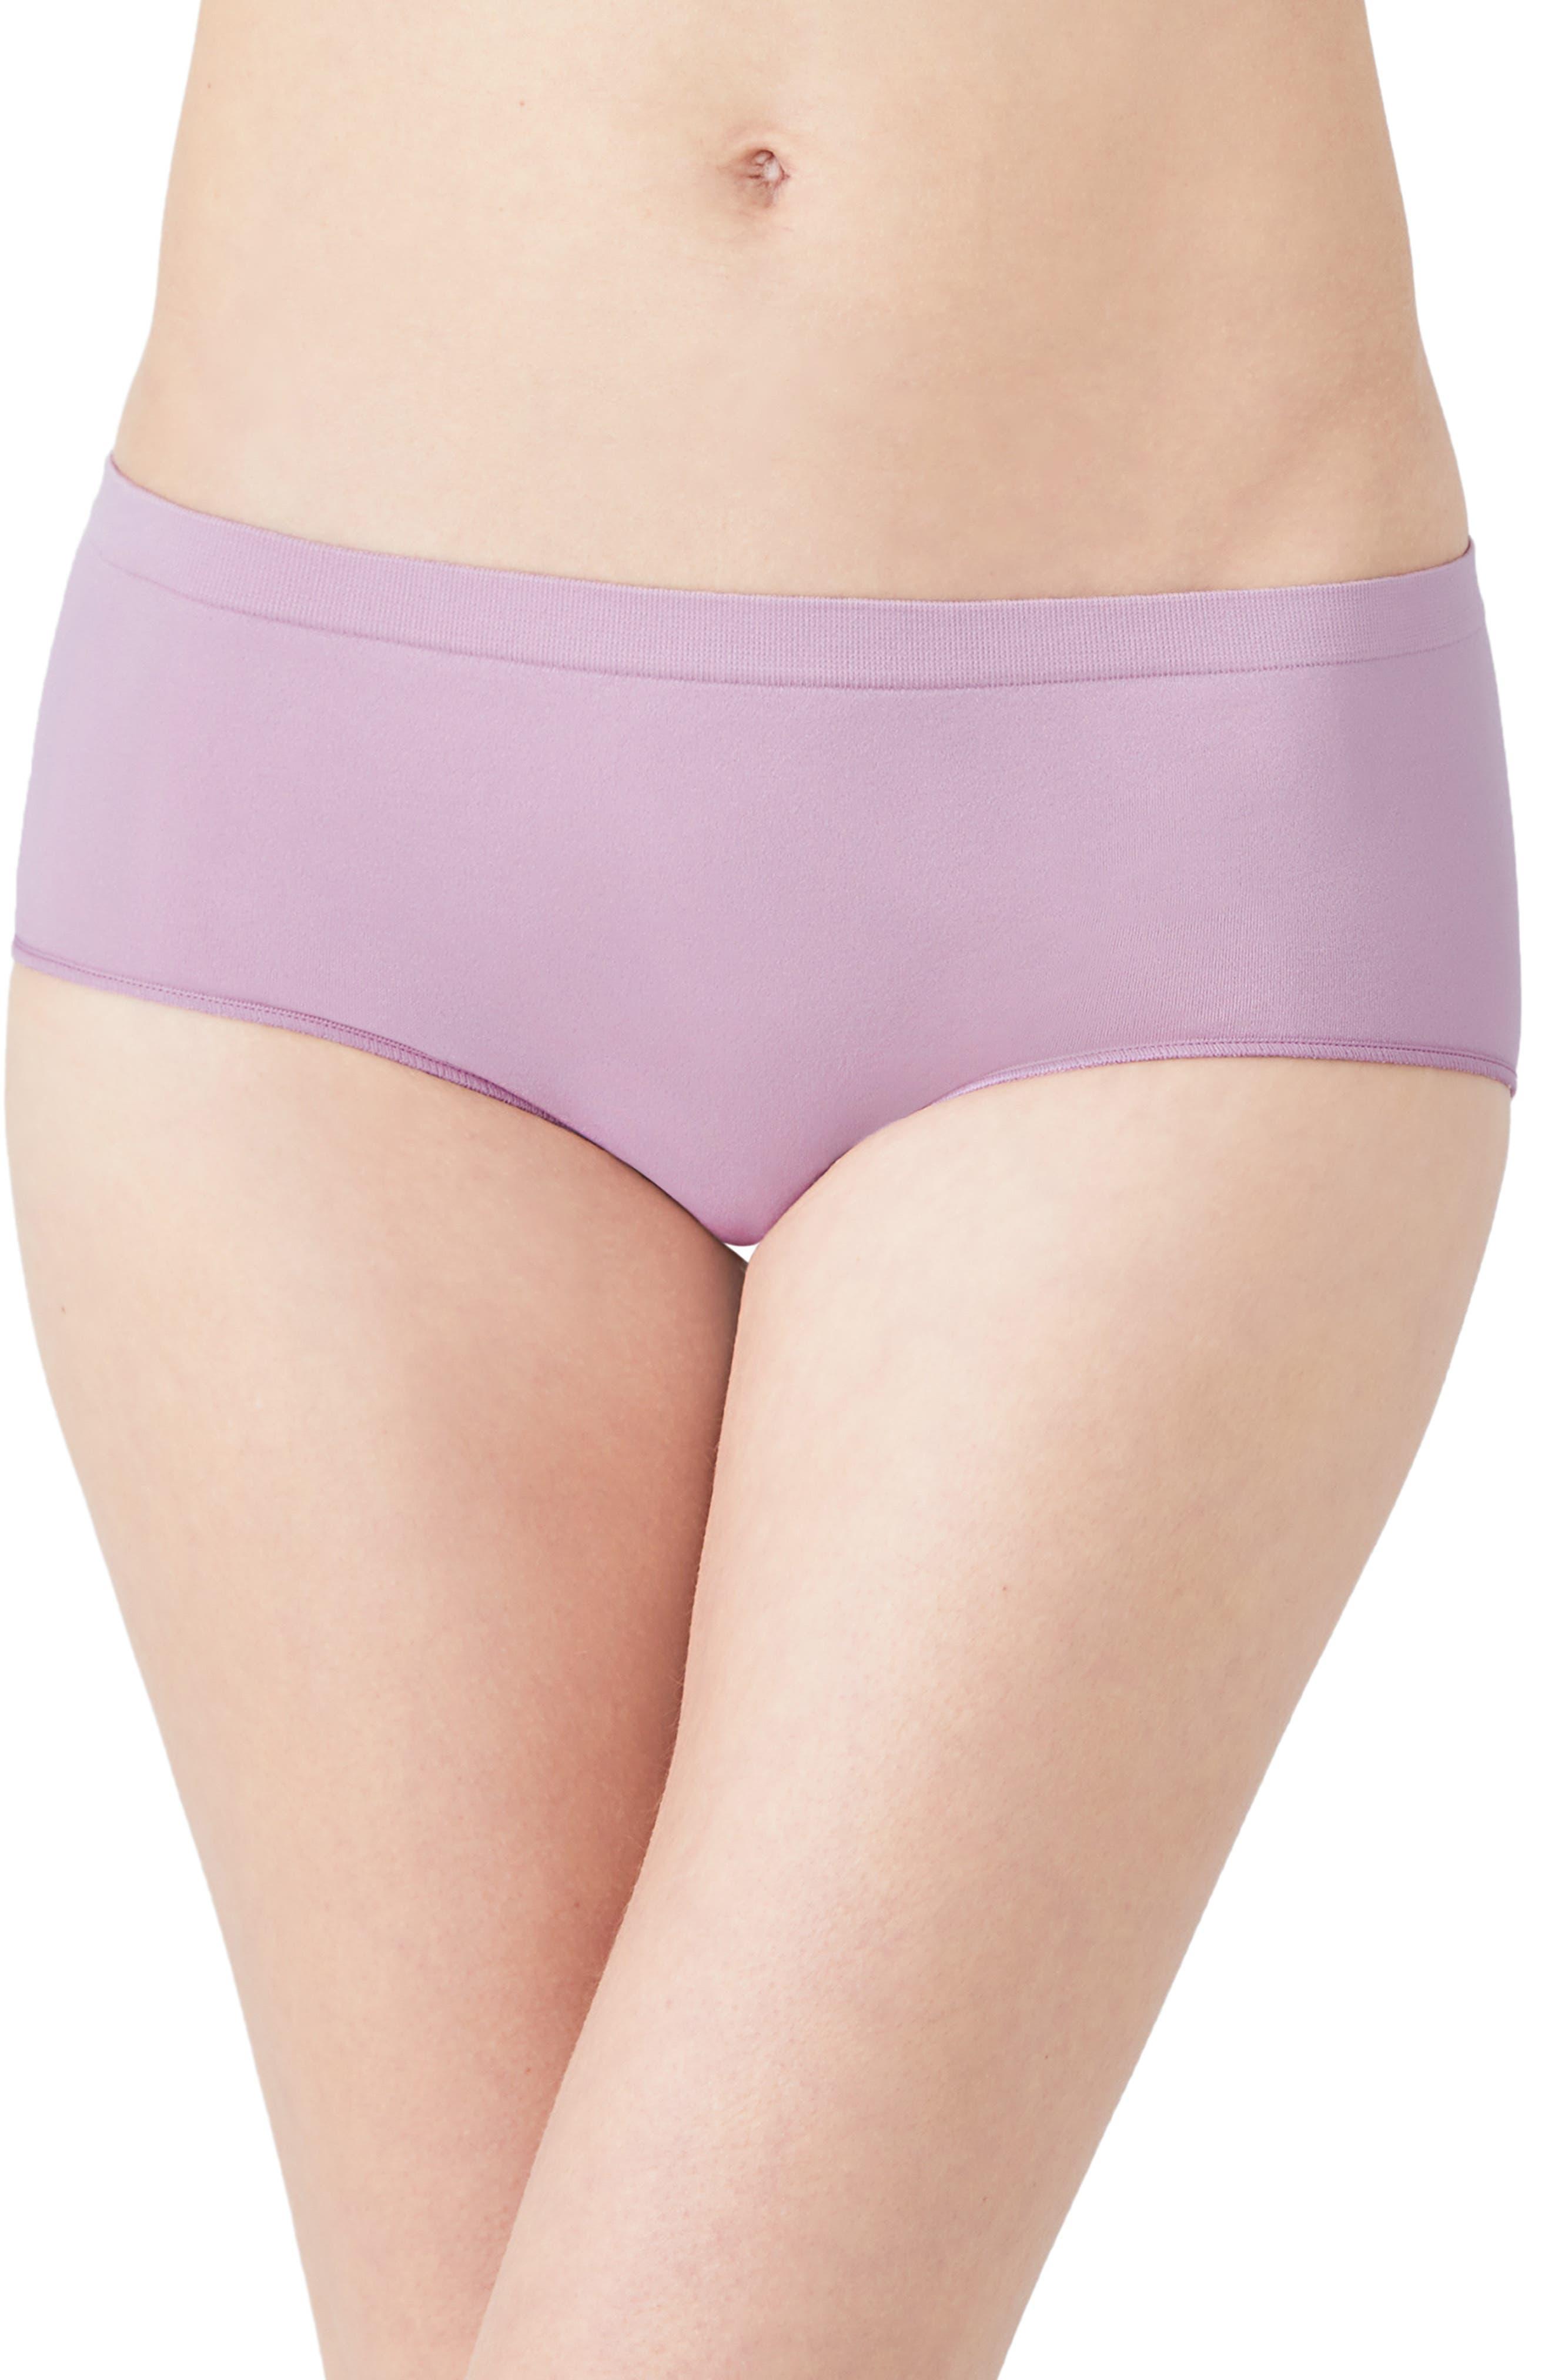 Comfort Intended Daywear Hipster Panties